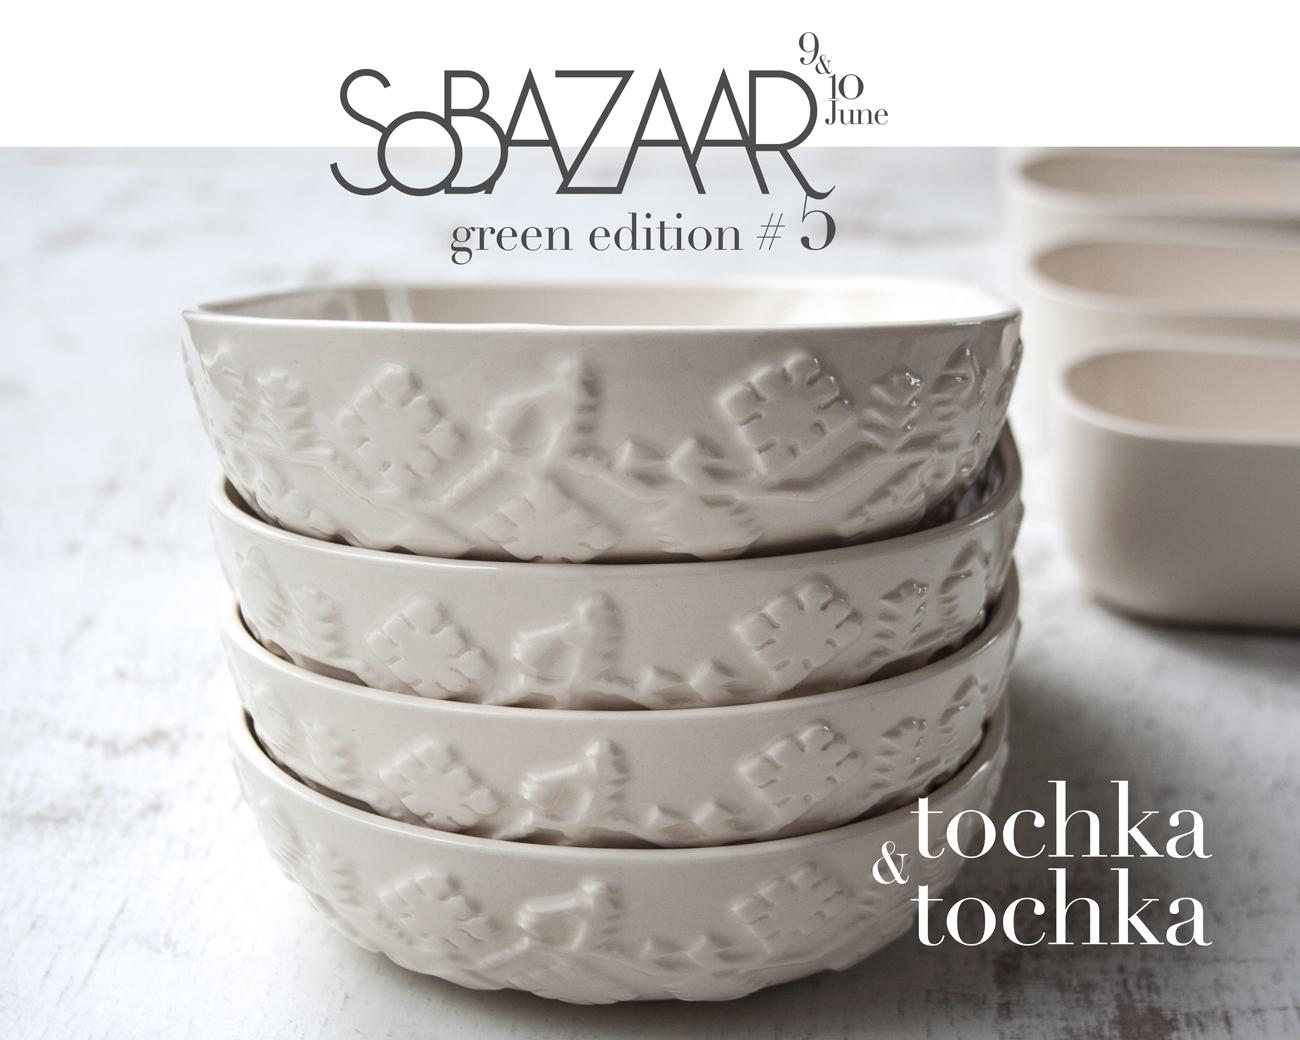 tochka-&-tochka-SoBAZAAR-green-edition-#-5-(1).jpg